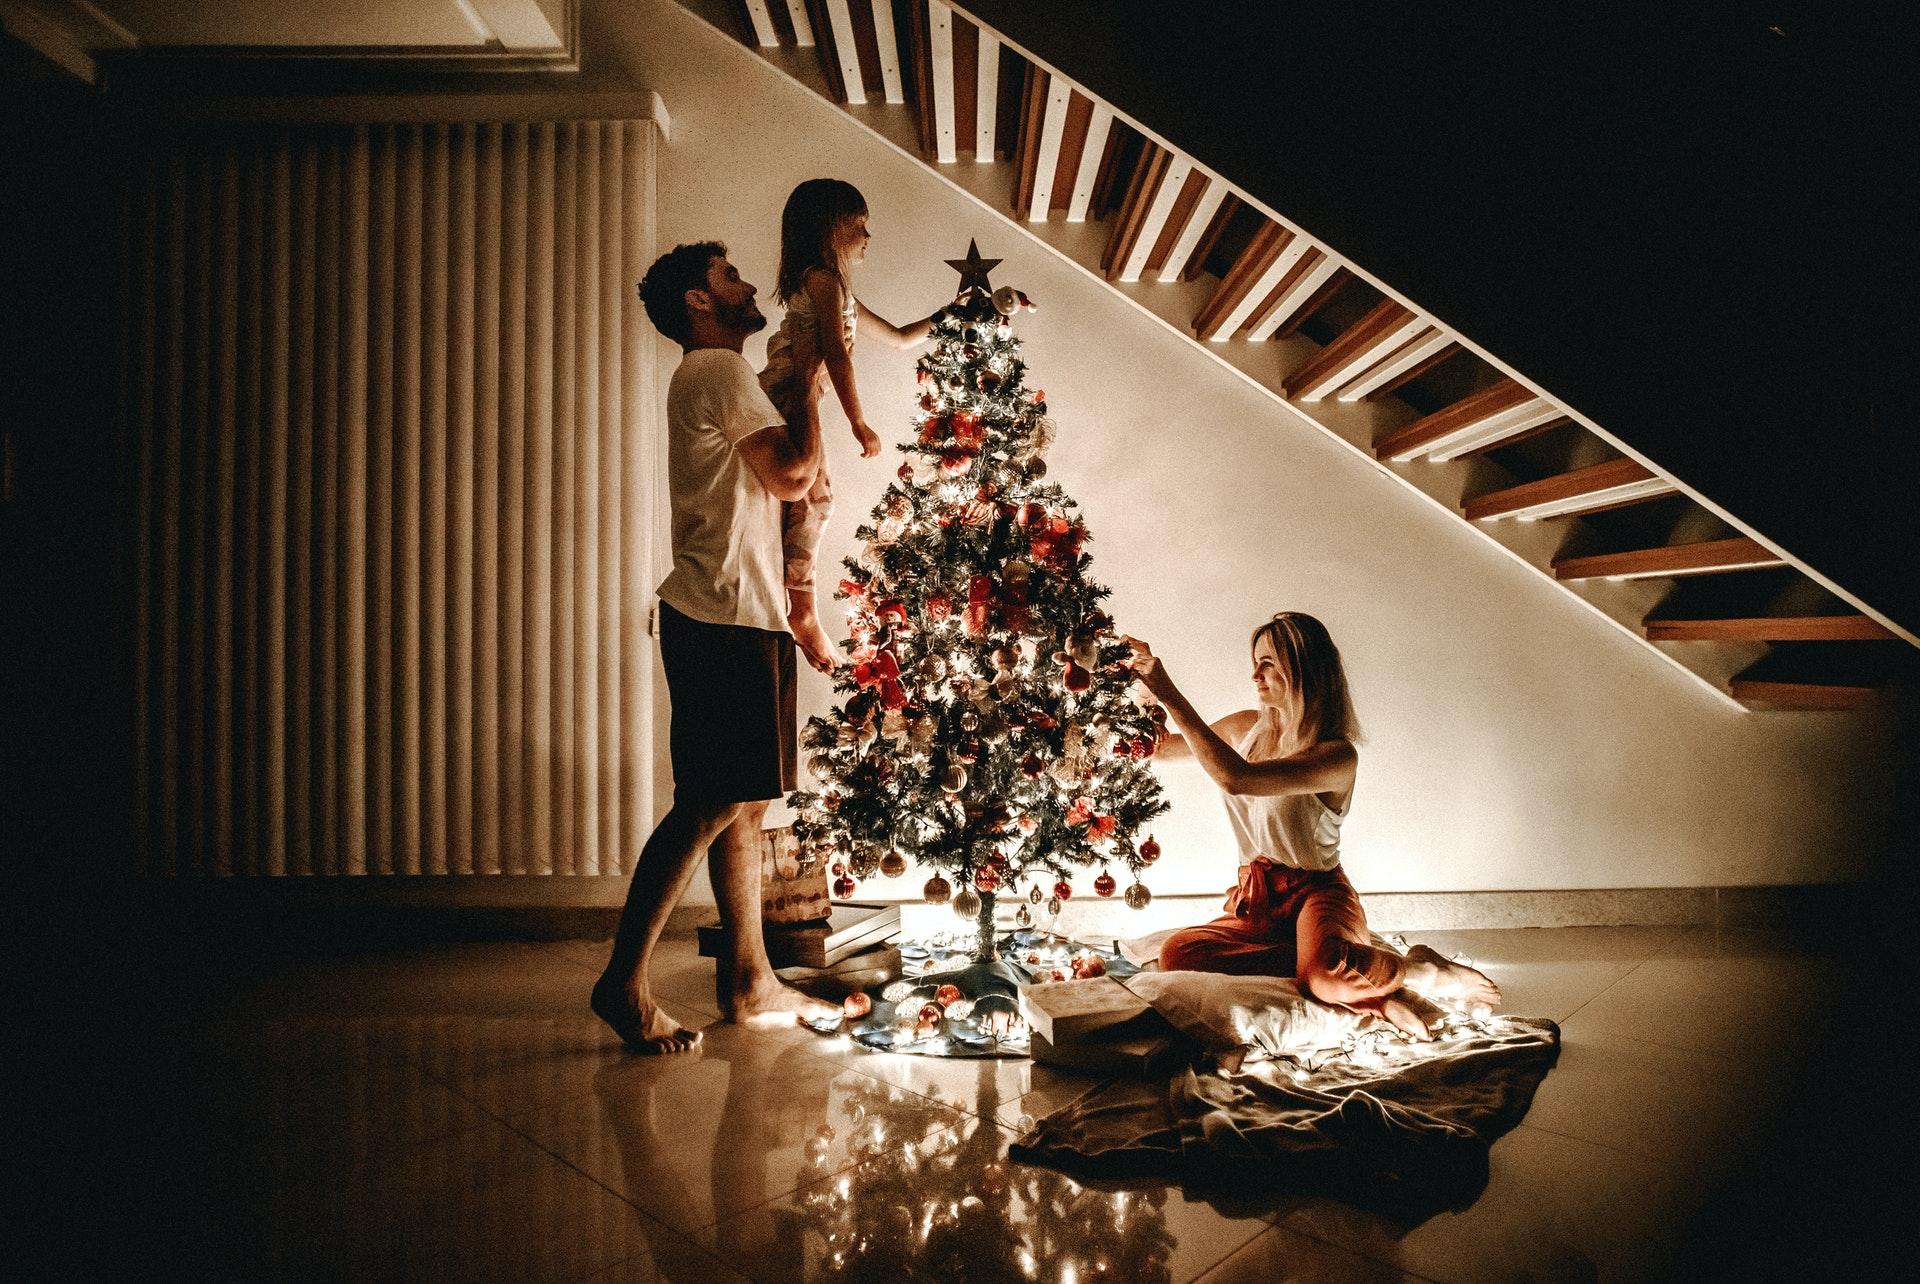 enjoy a Christmas adventure